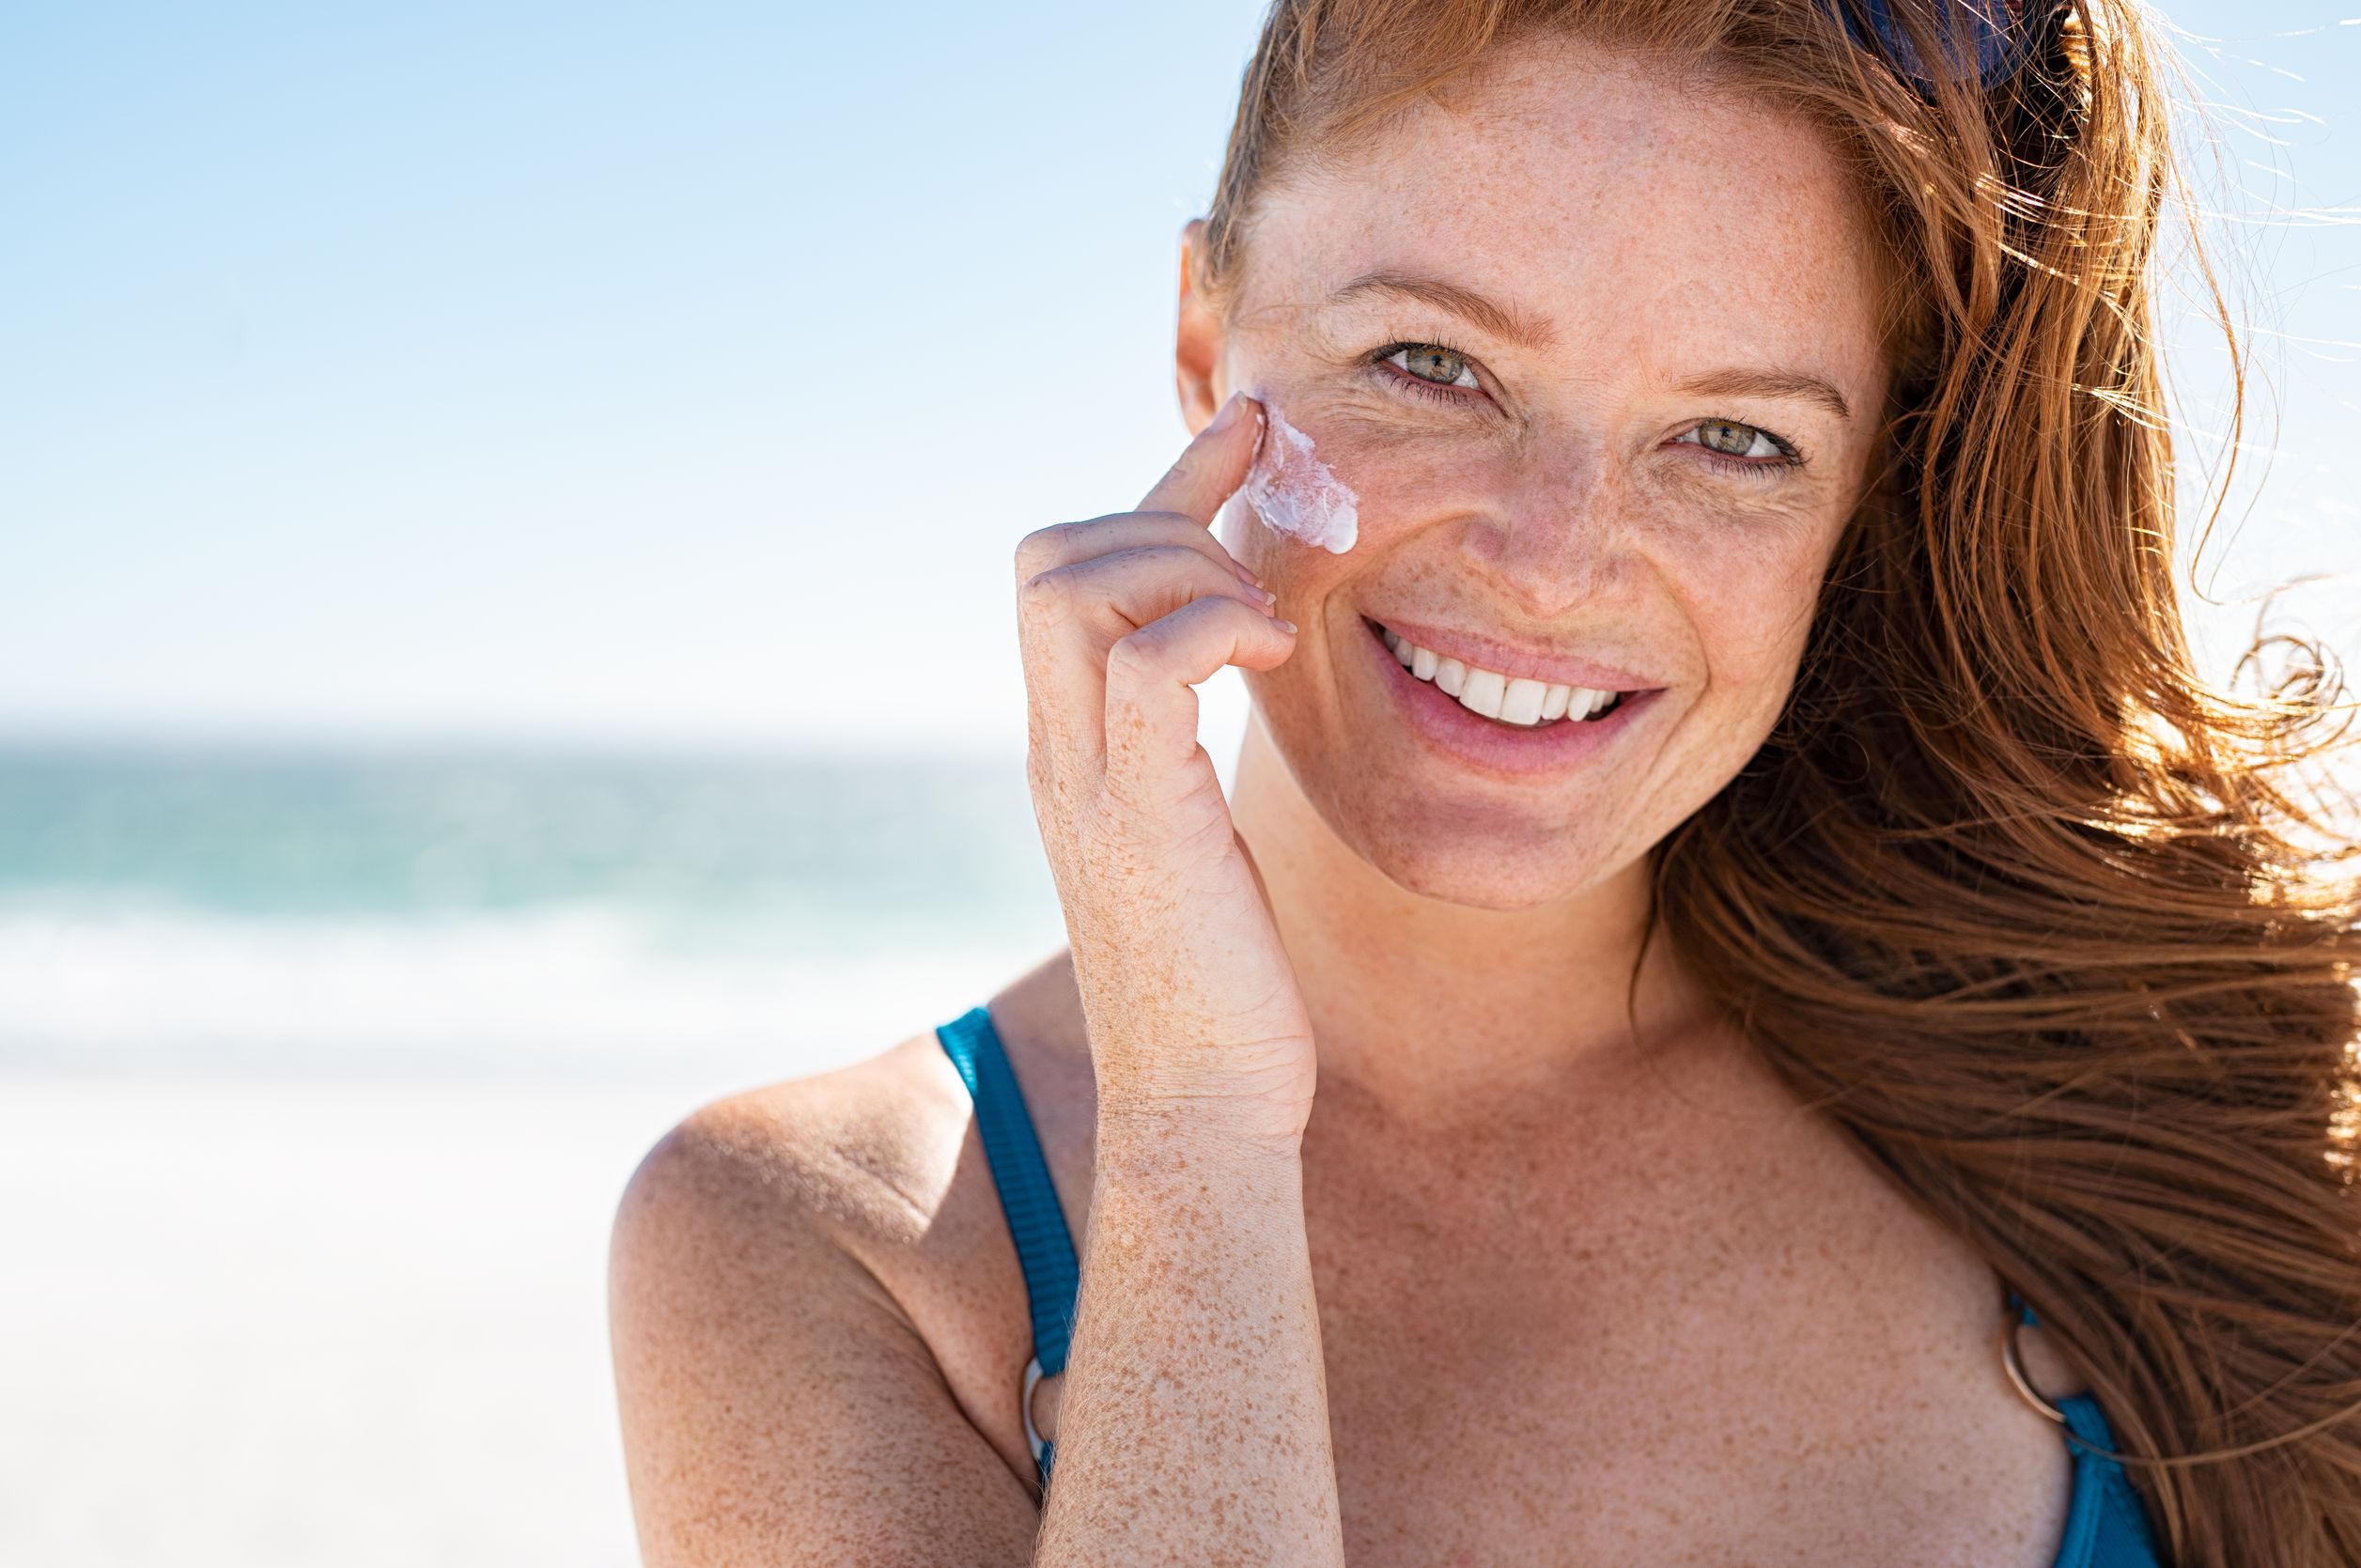 Mulher na praia passando protetor solar no rosto.